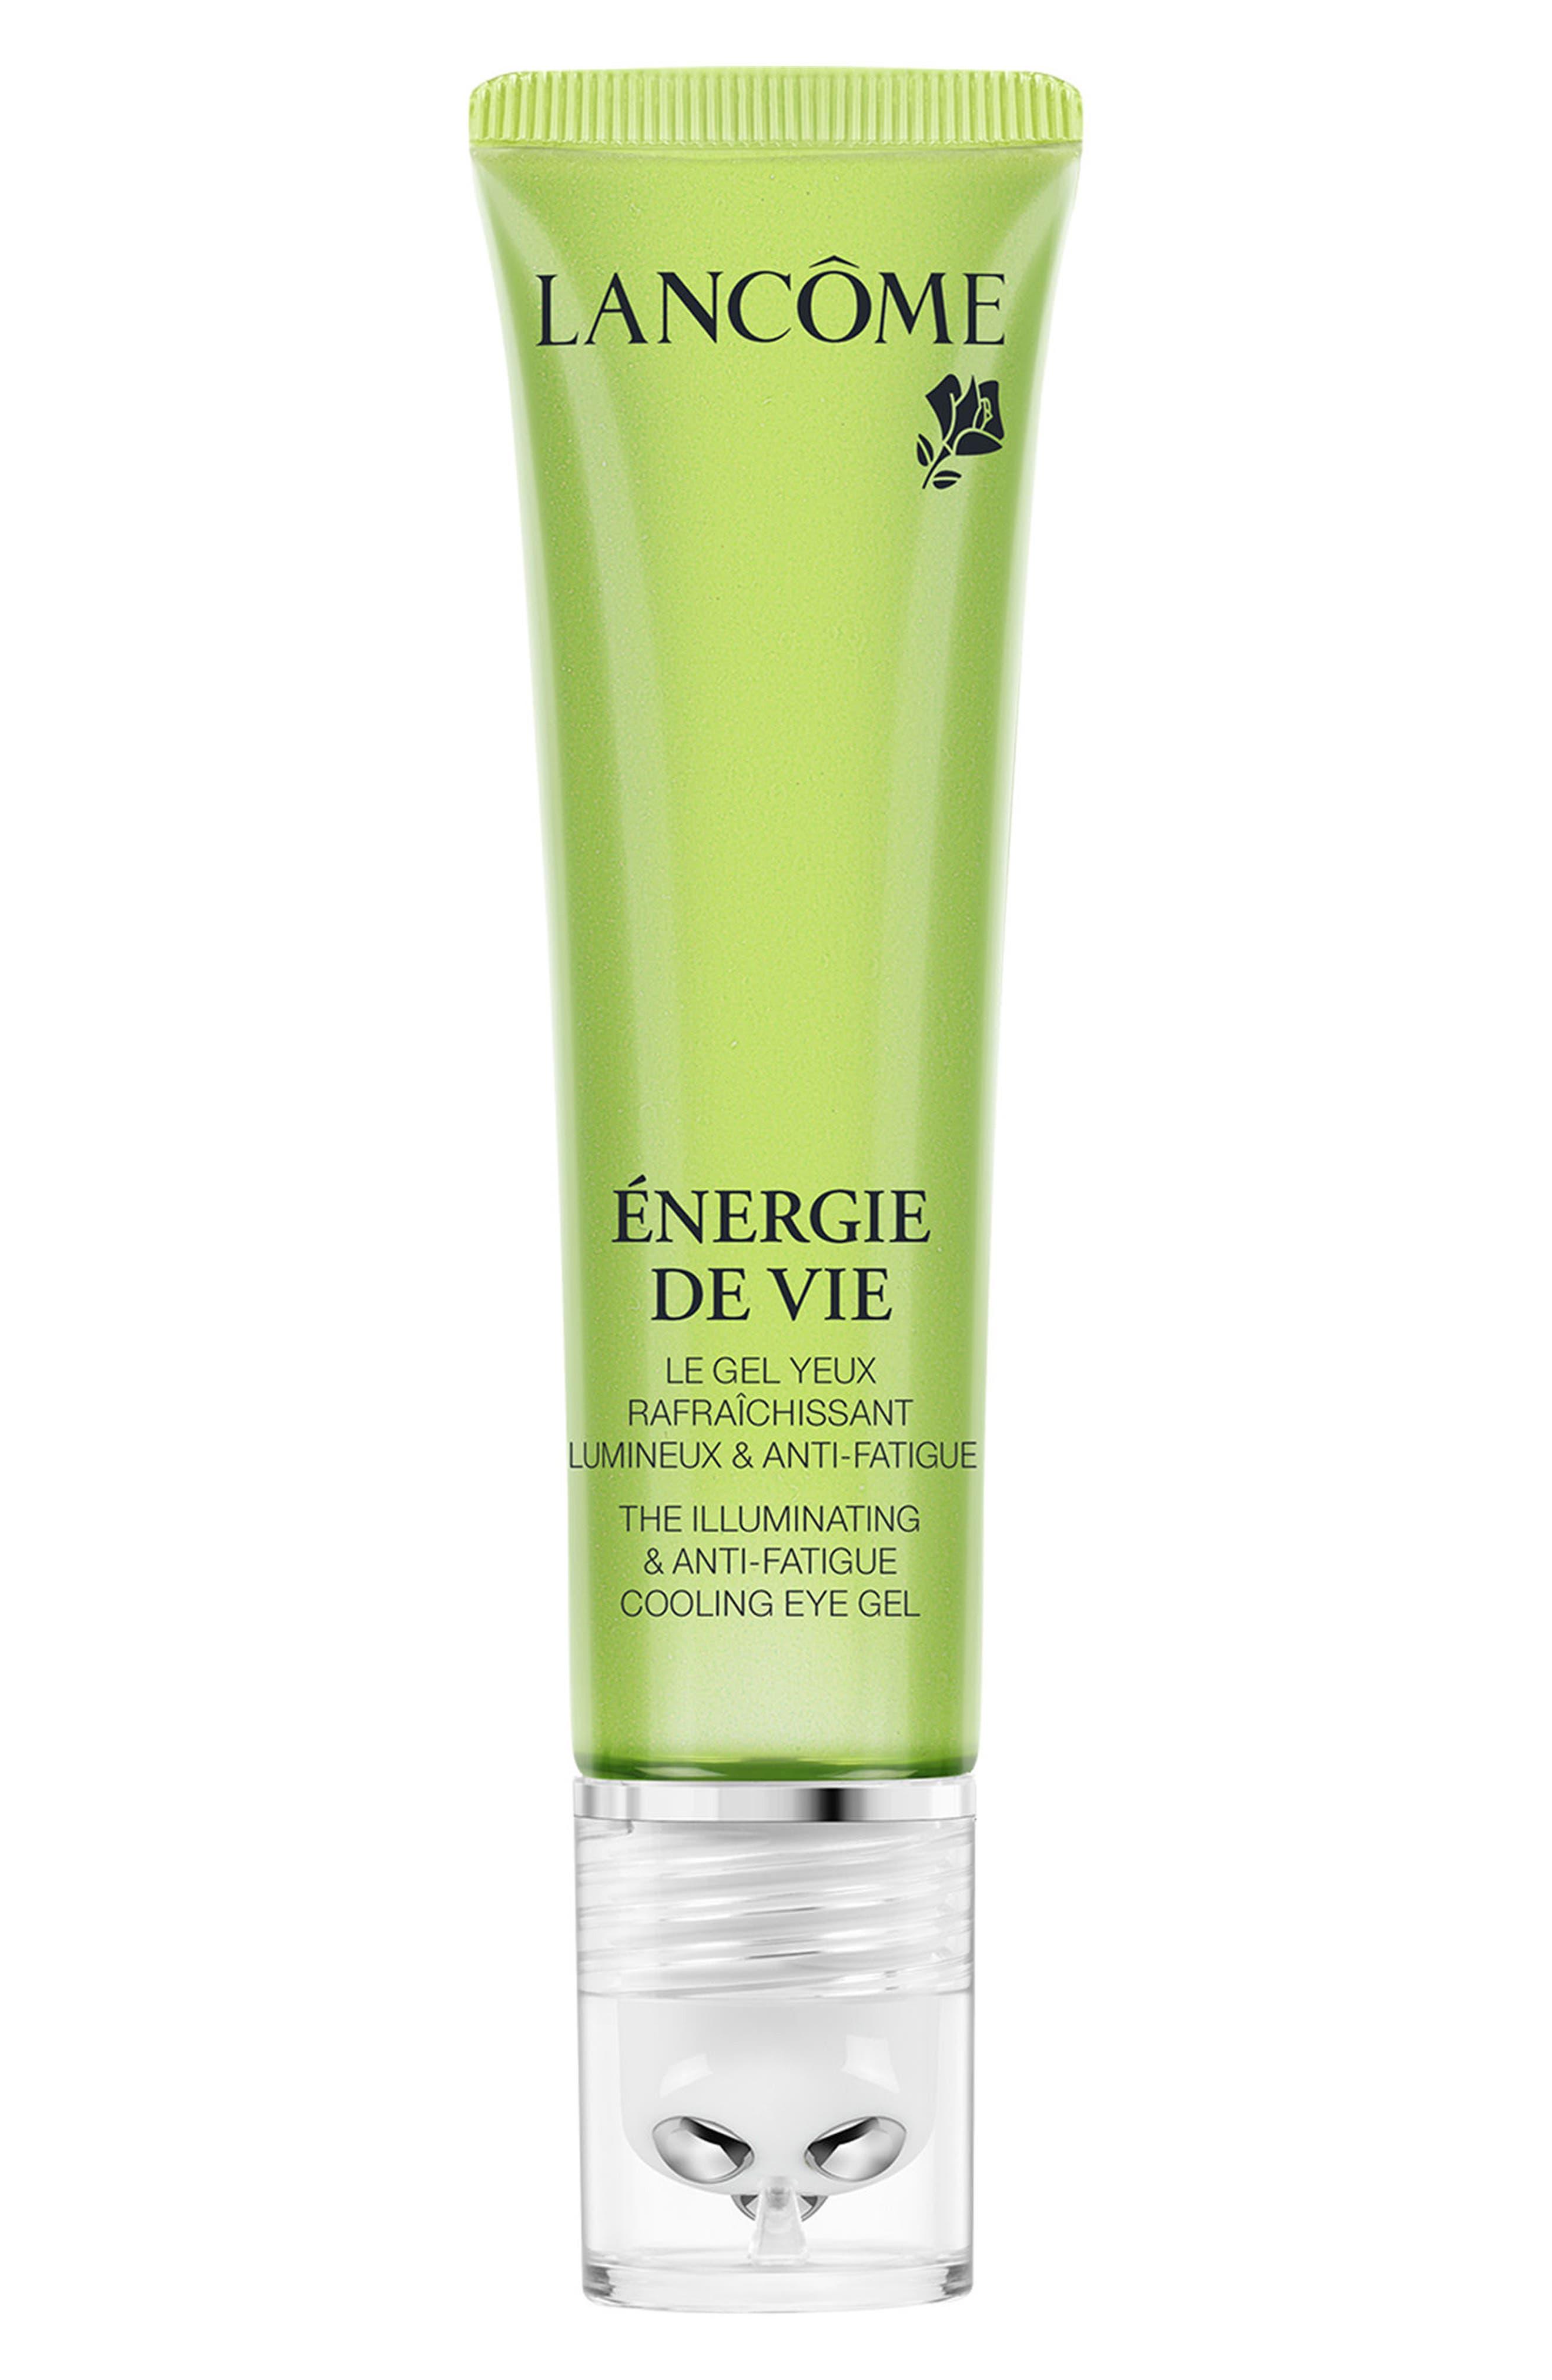 Lancôme Energie de Vie The Illuminating & Anti-Fatigue Cooling Eye Gel